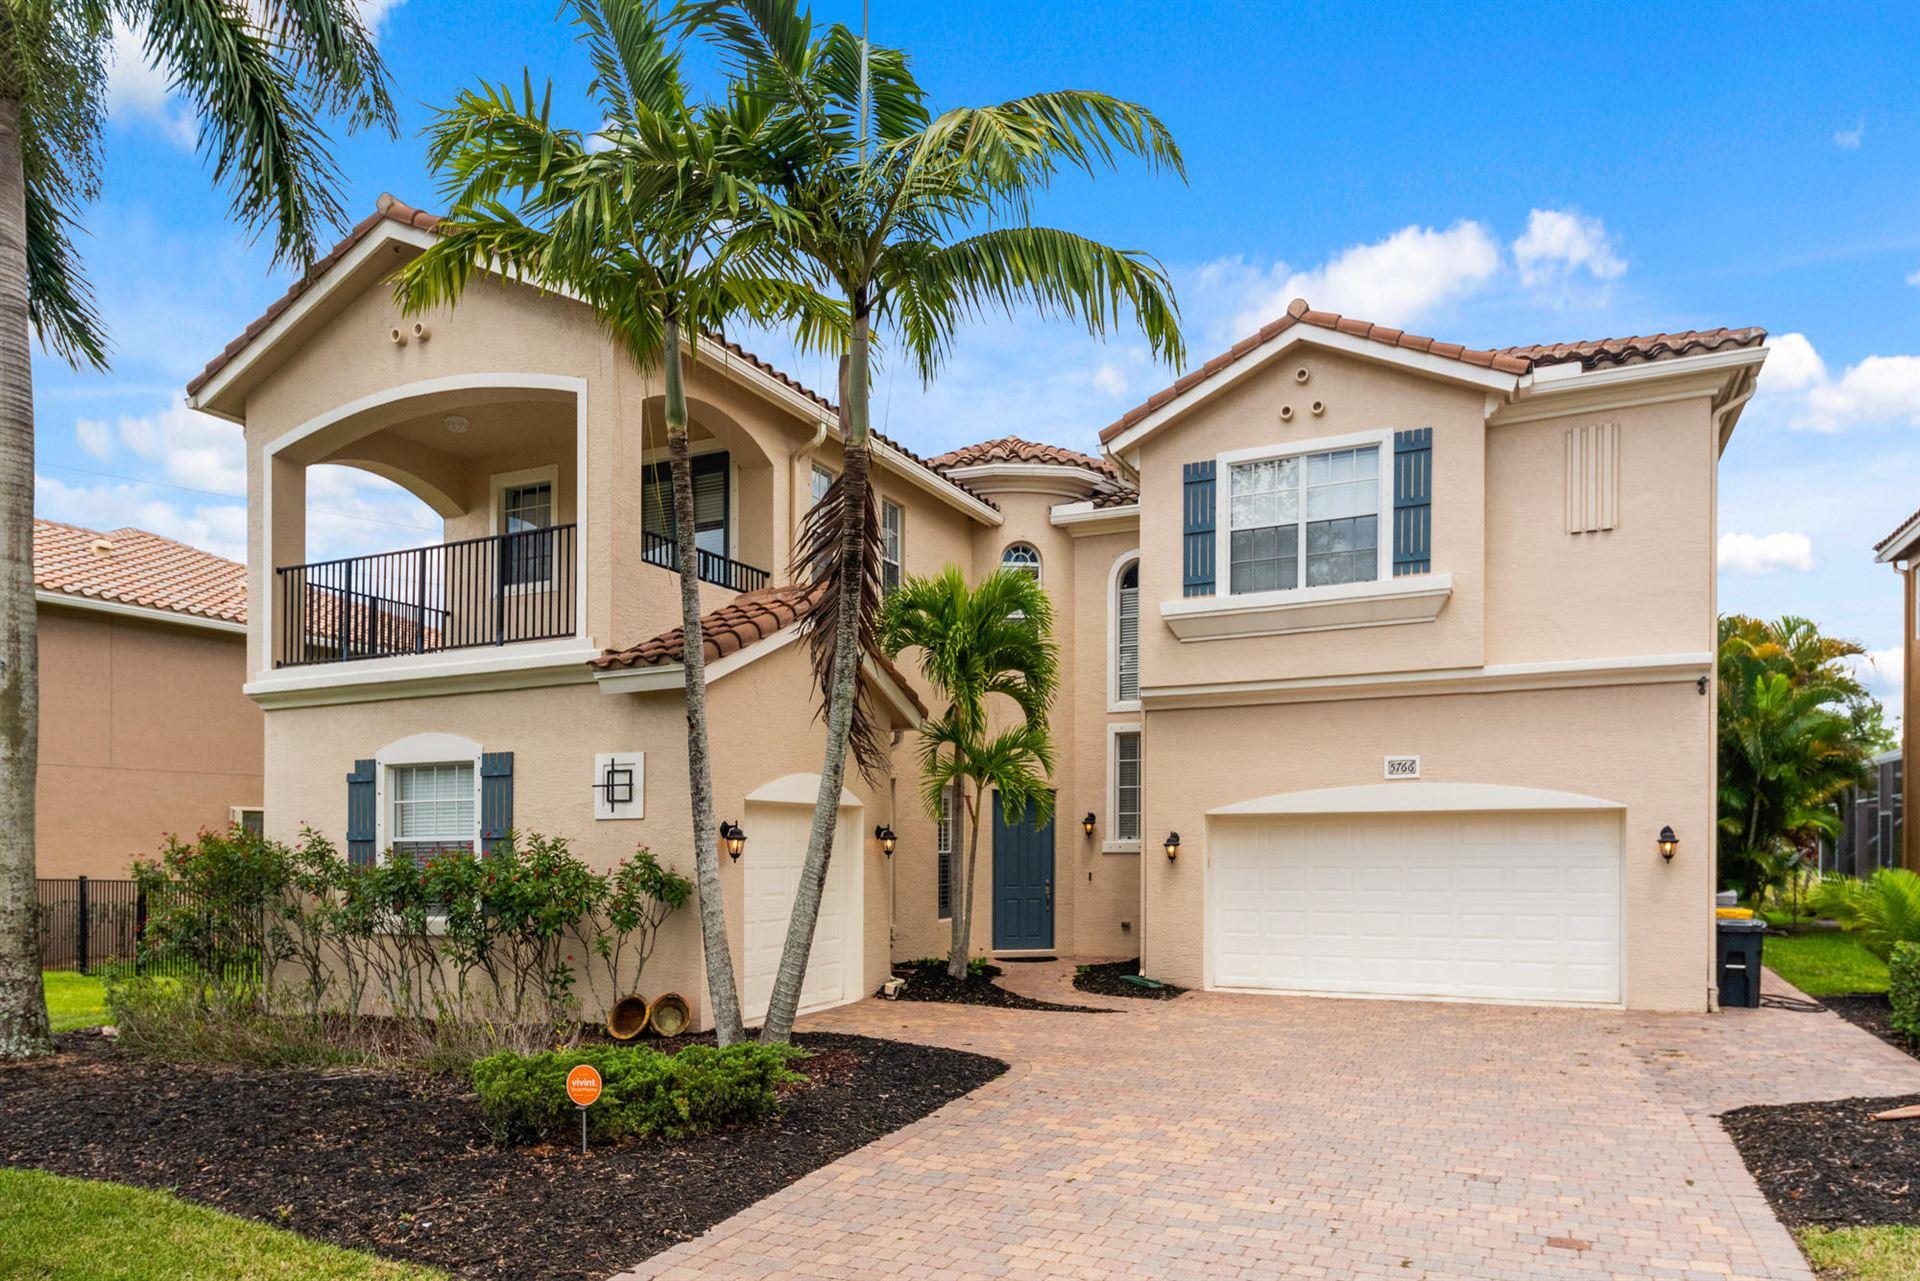 Photo of 5766 SW Bald Eagle Drive, Palm City, FL 34990 (MLS # RX-10737877)